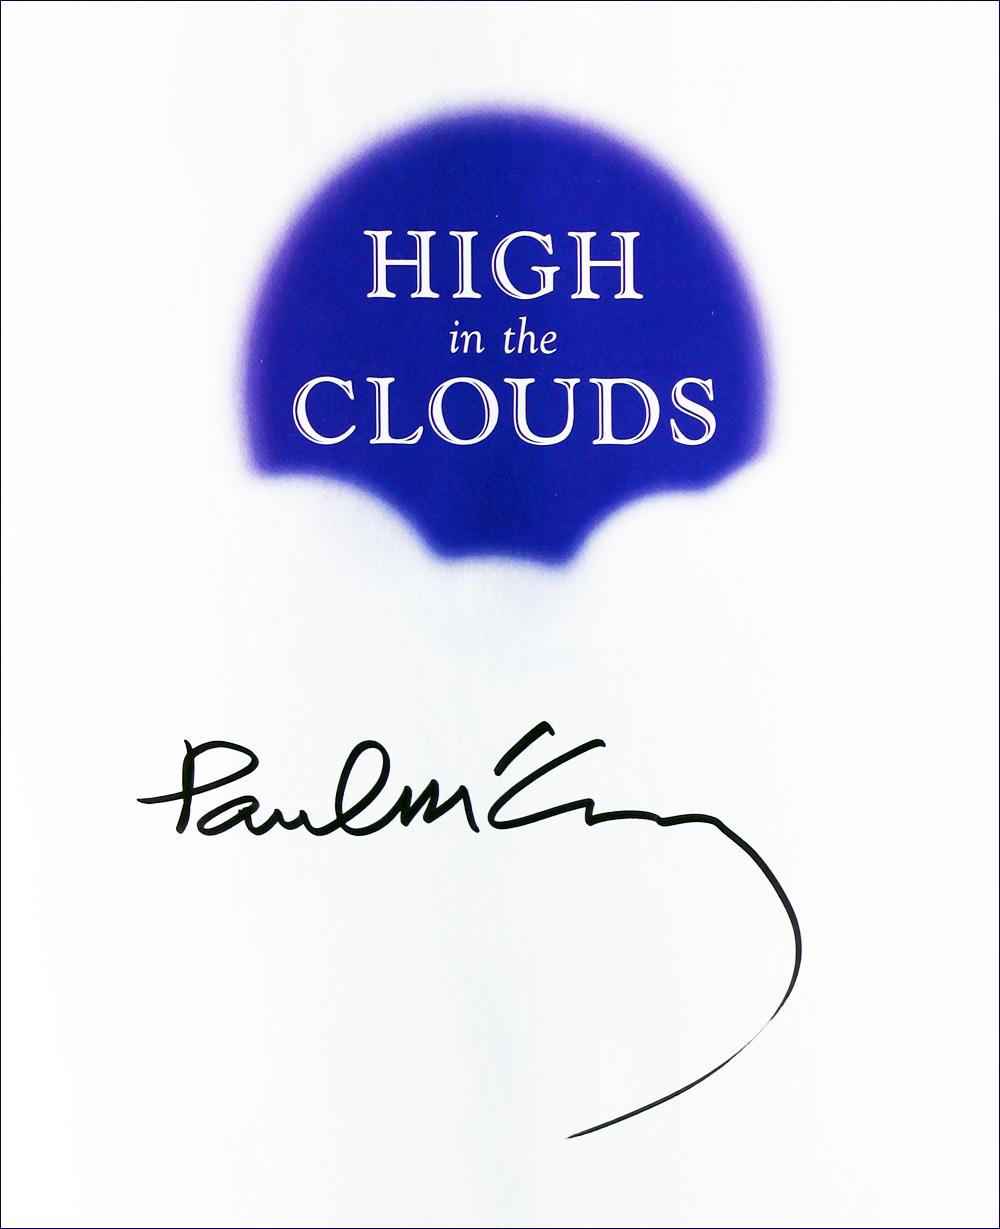 Book - High in the Clouds - Paul McCartney - Inside #1